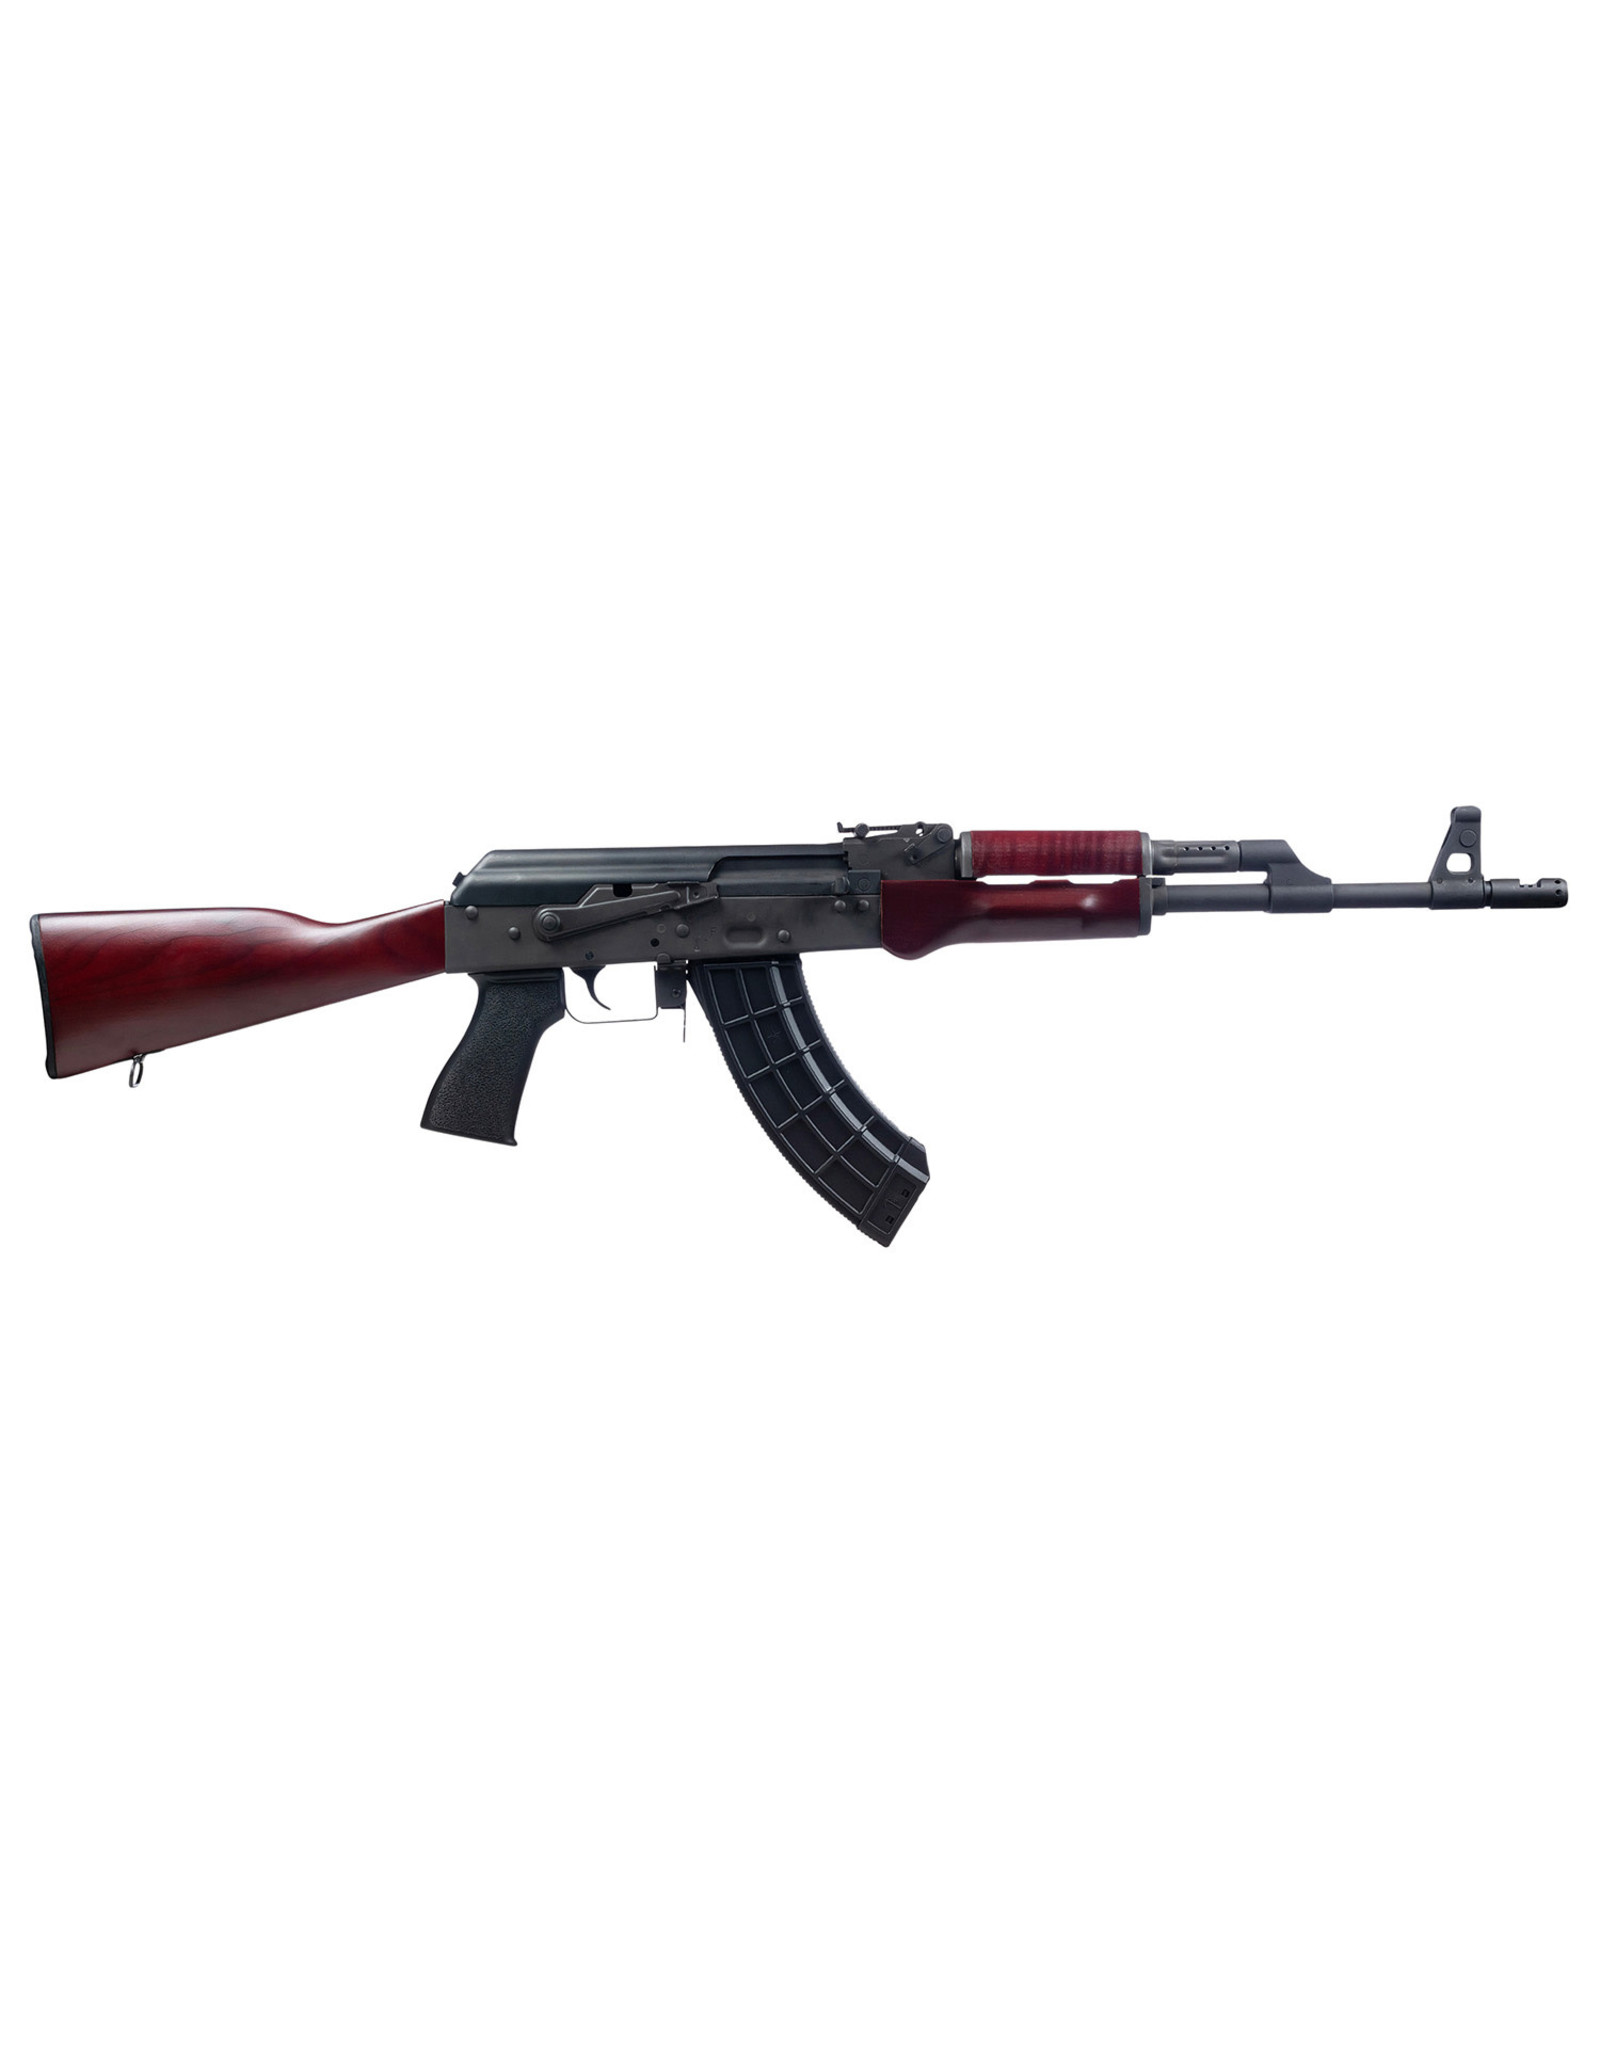 Century Arms VSKA 7.62x39mm Redwood 30+1 Round